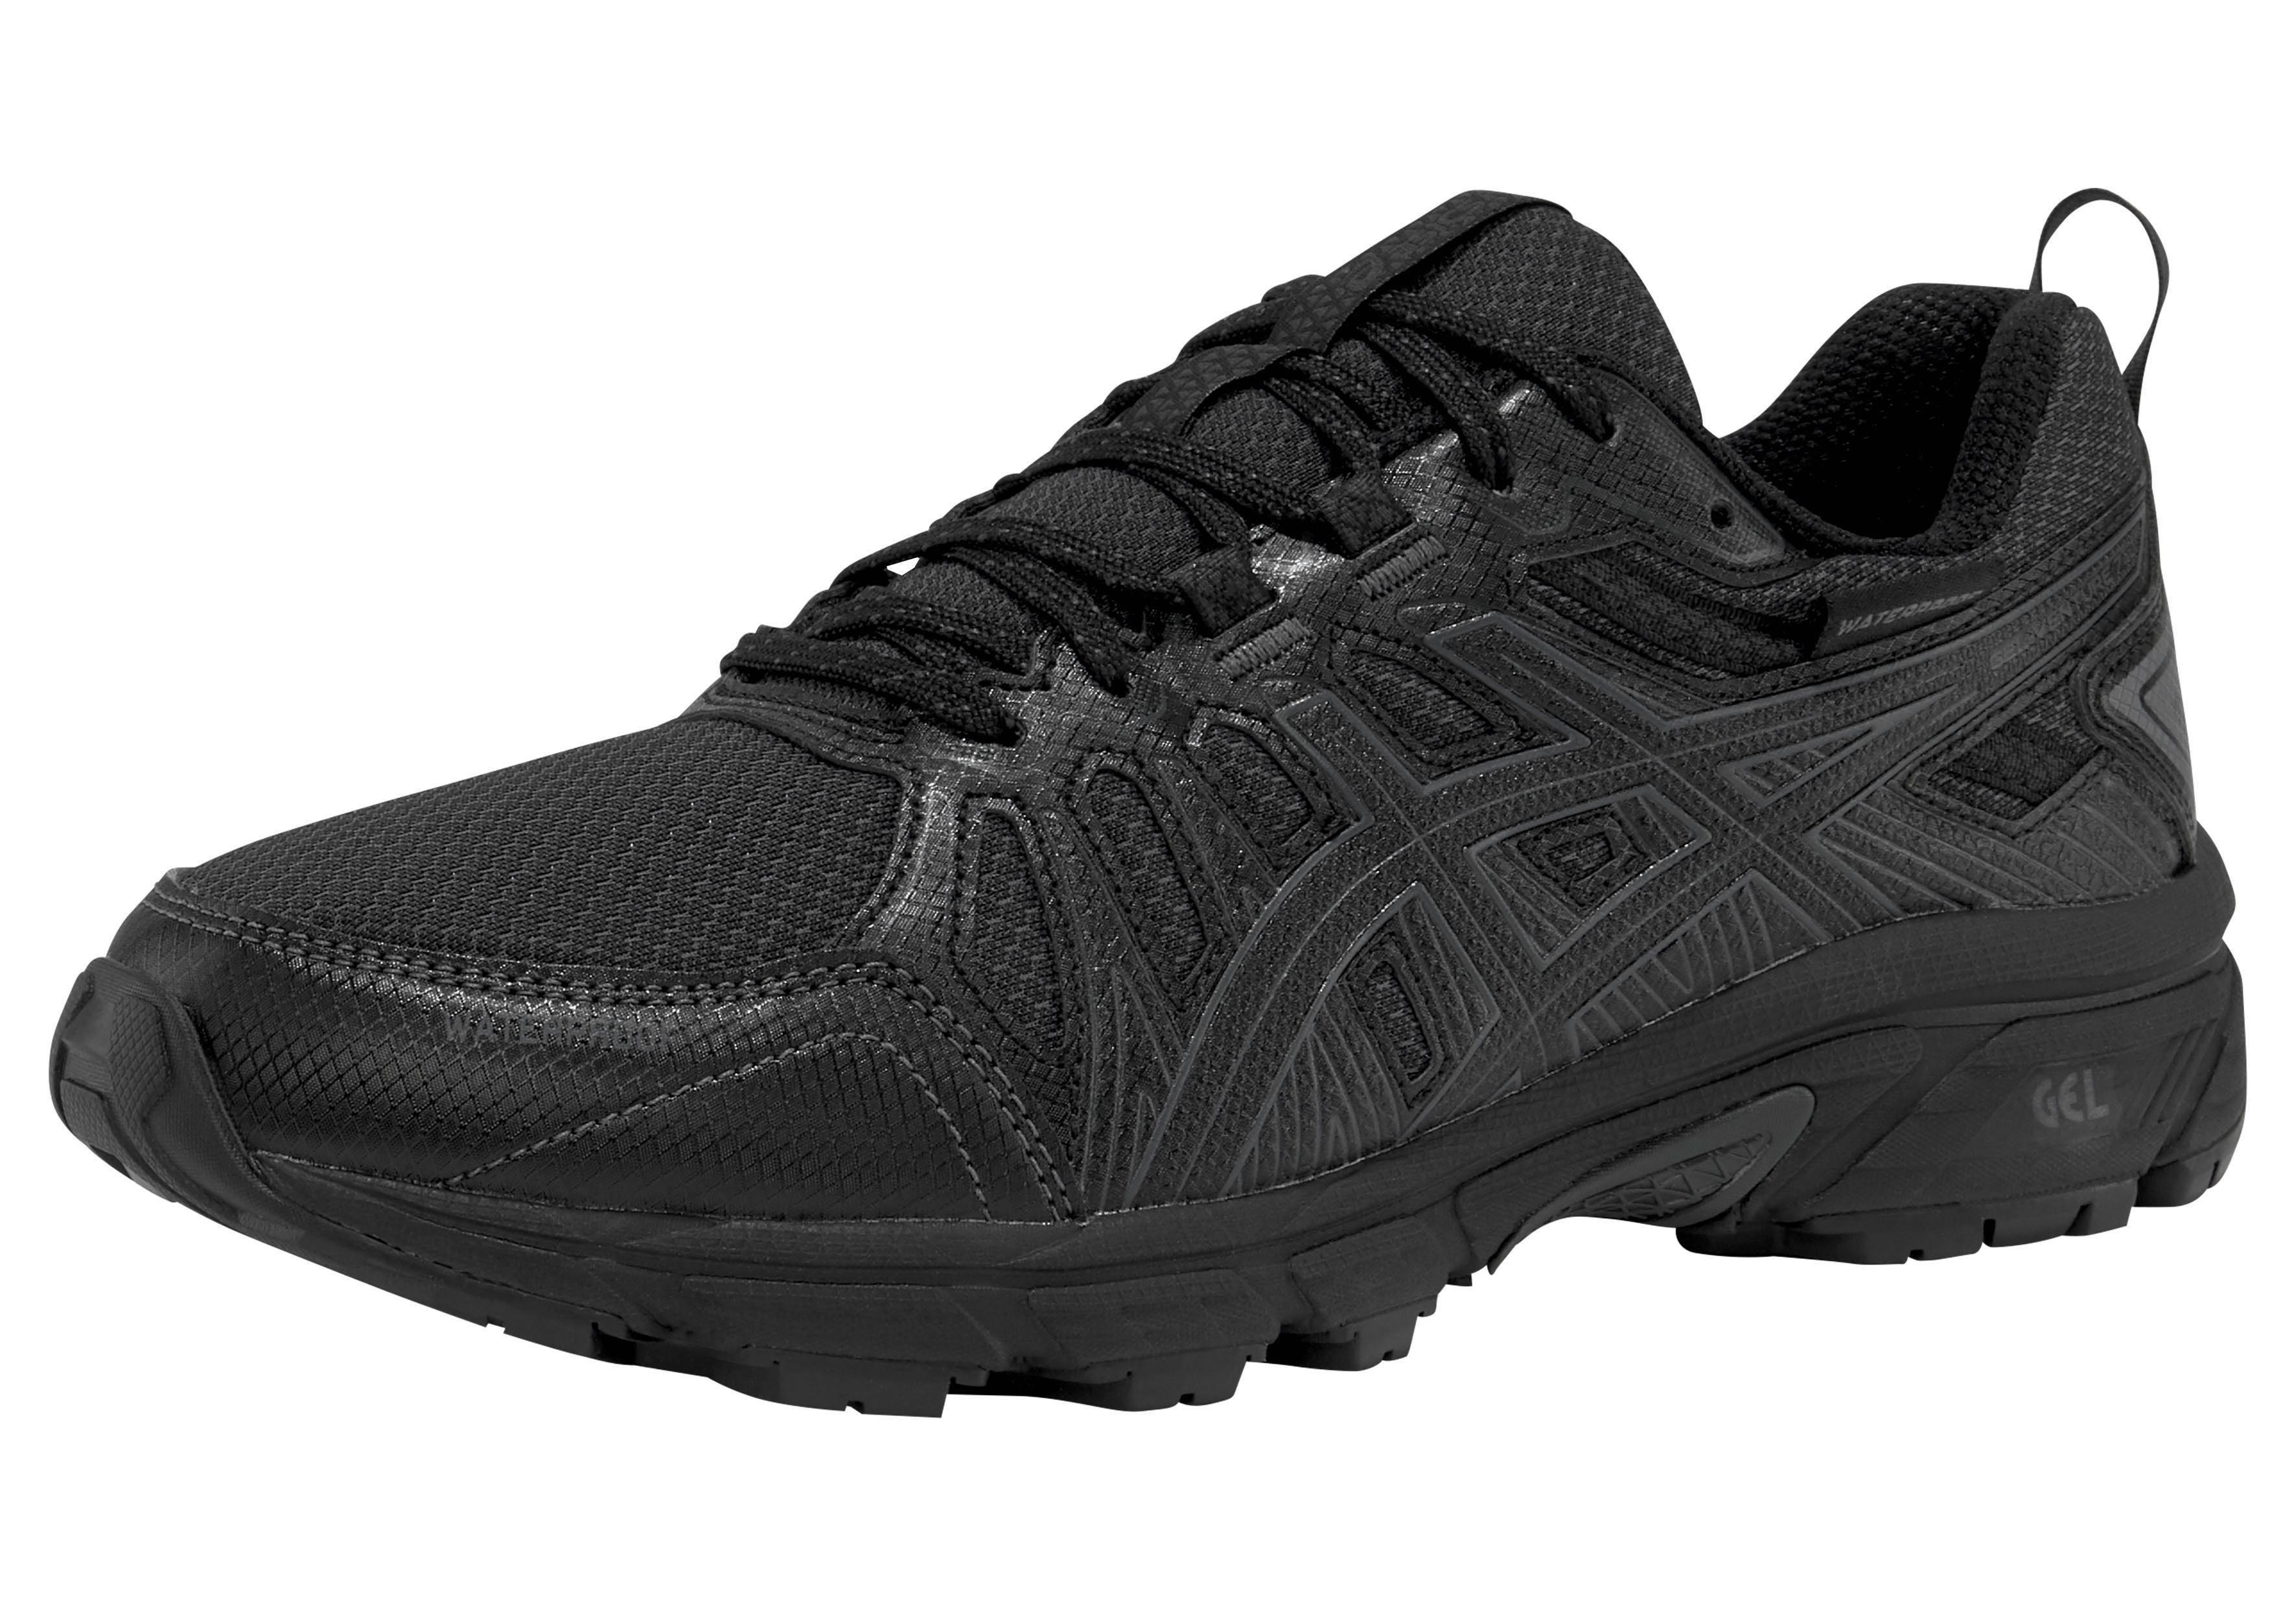 Schuhe Herren Laufschuhe Wasserdicht Leicht Mesh